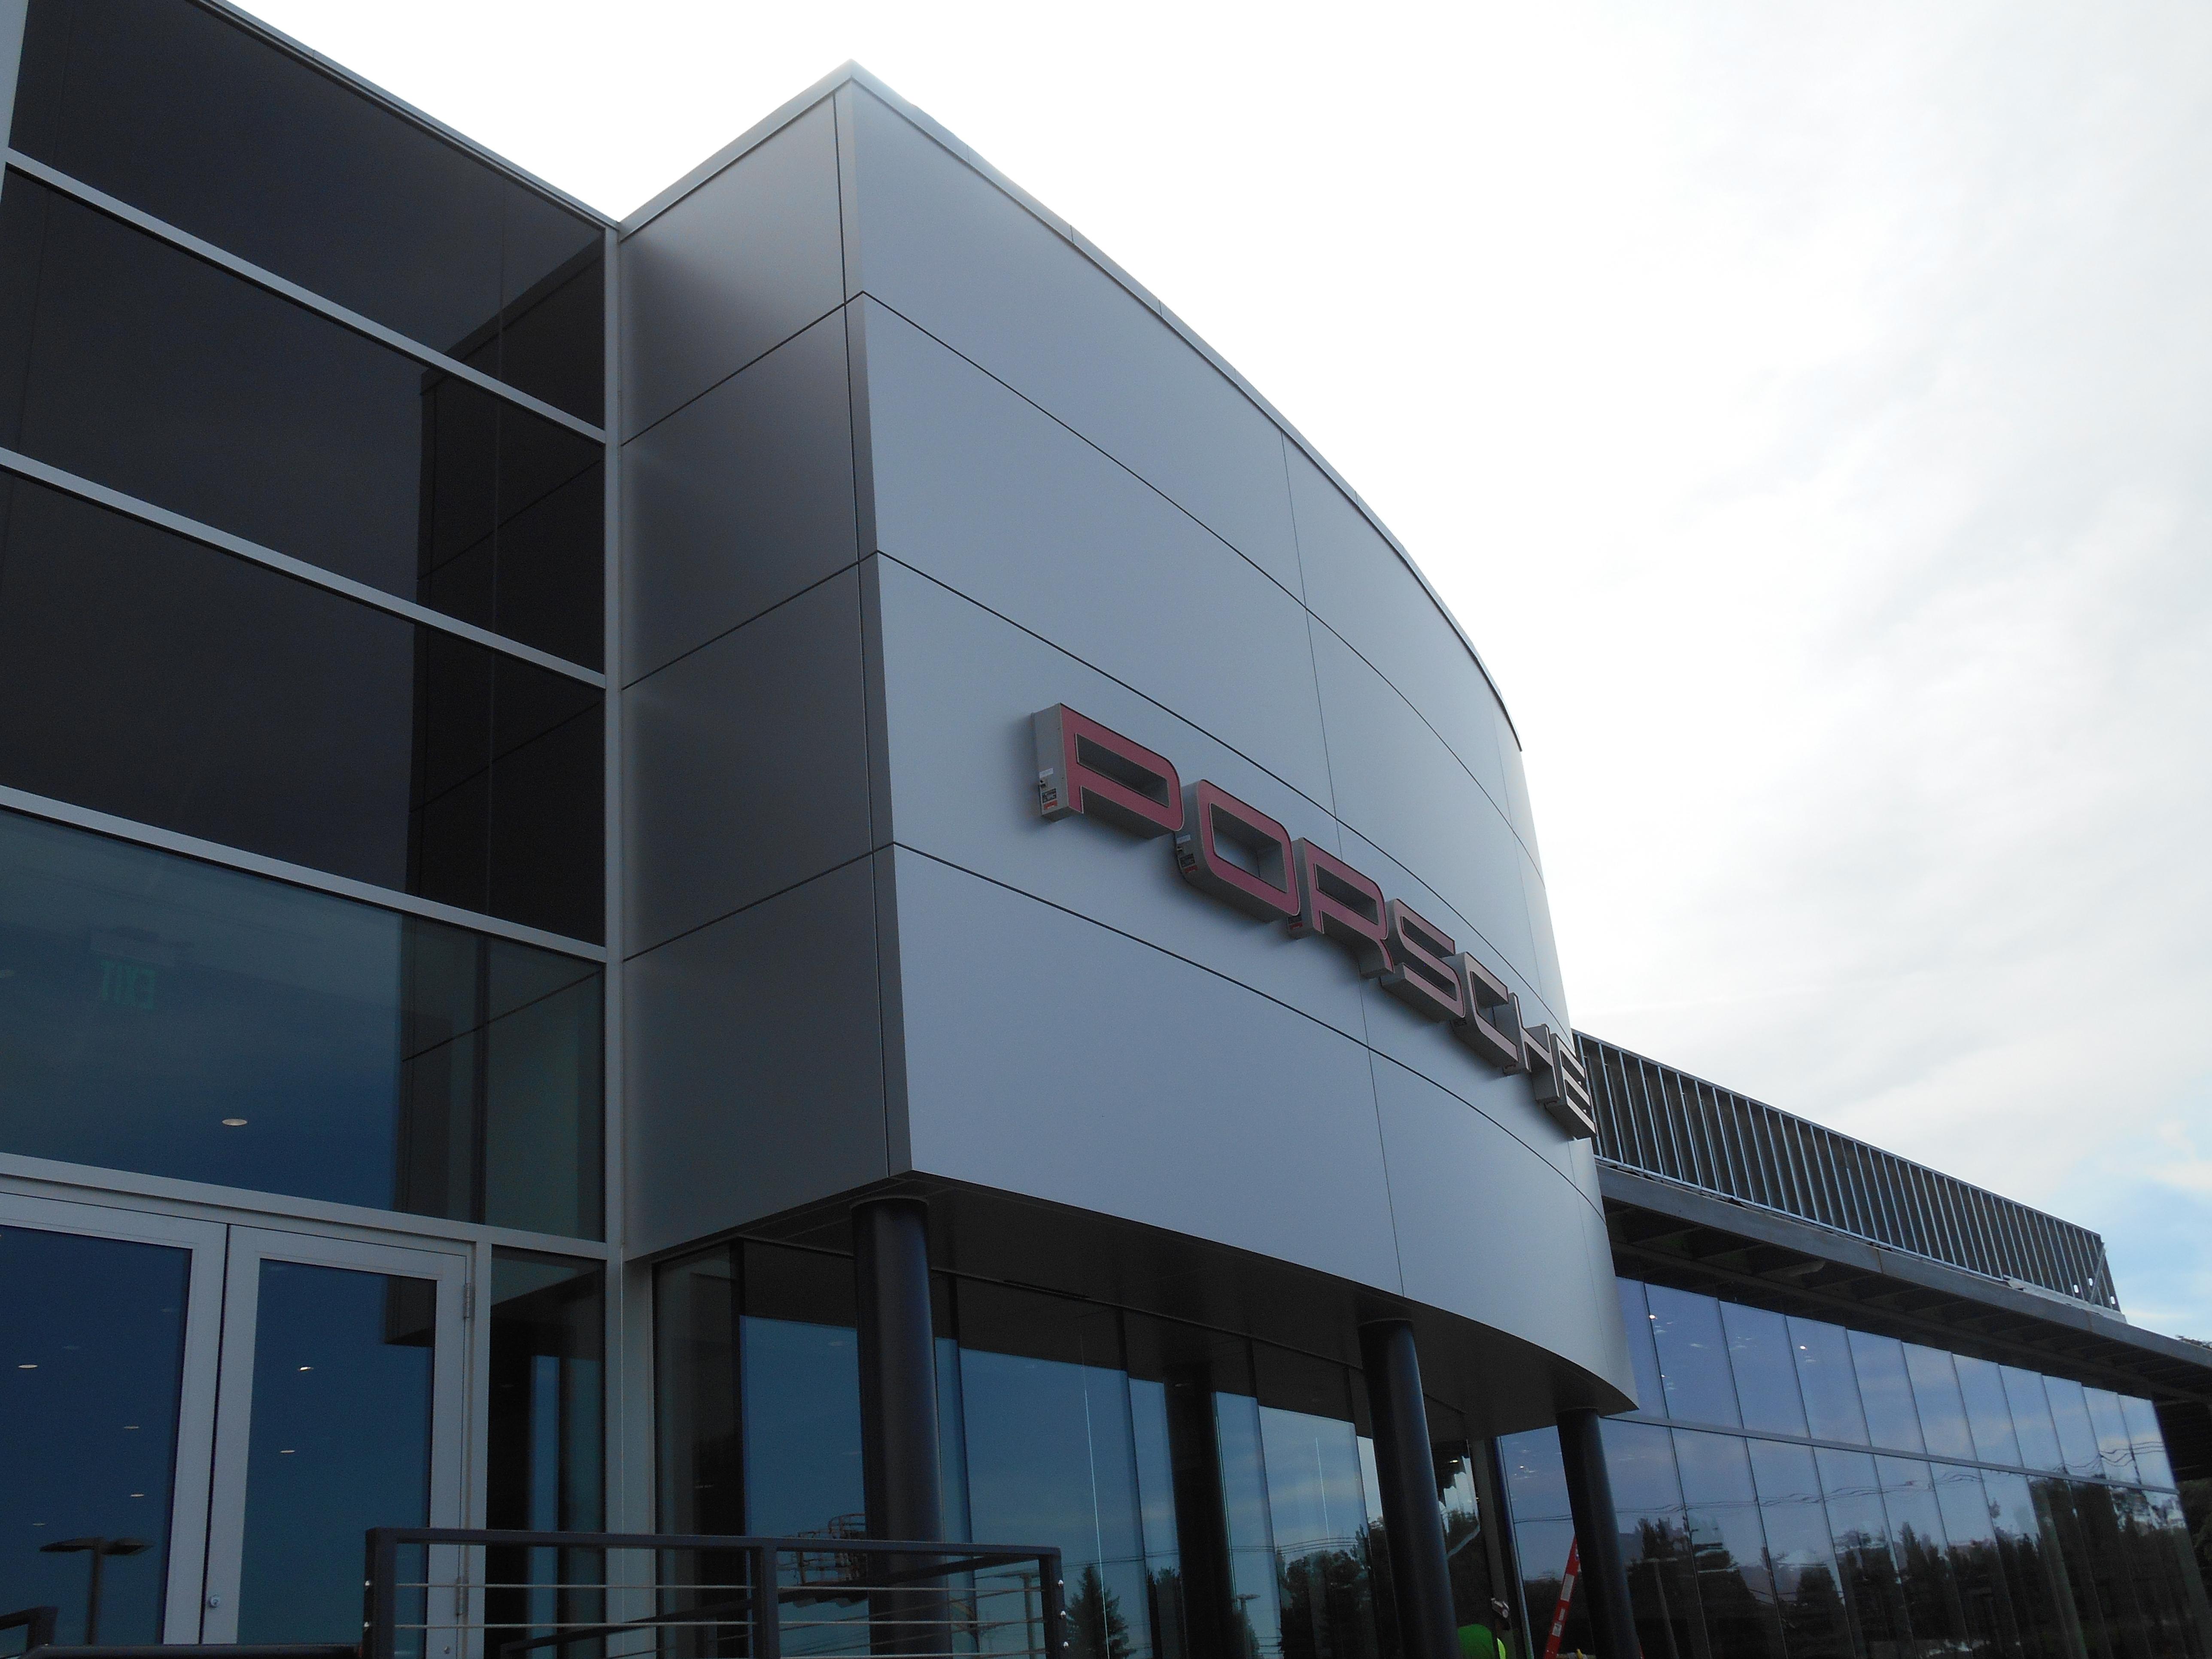 Orlando Kia North >> C4000 rain screen panels SAF – Southern Aluminum Finishing Co, Inc.